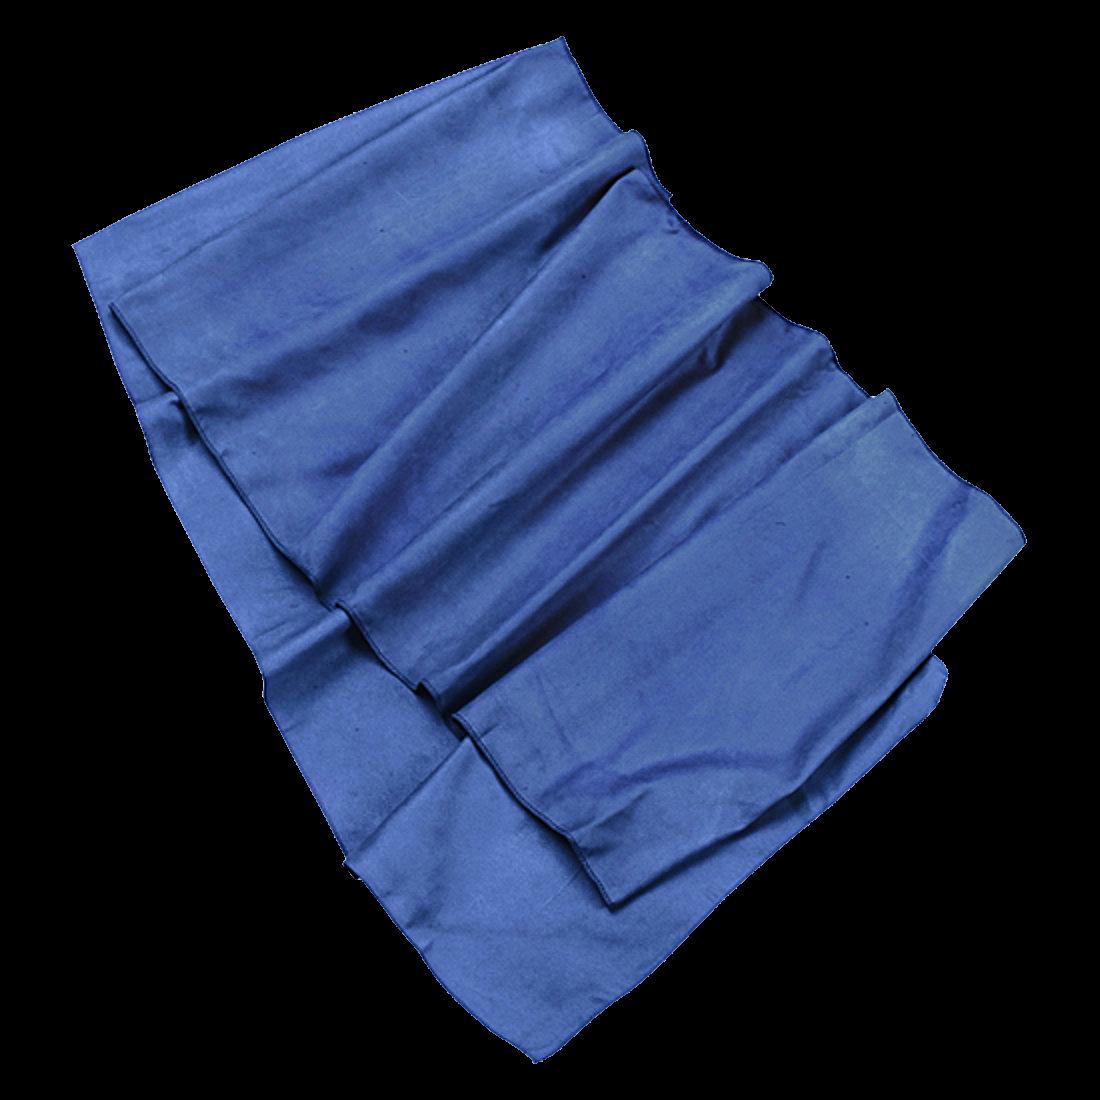 trekmates microfibre travel towel m asciugamano da. Black Bedroom Furniture Sets. Home Design Ideas